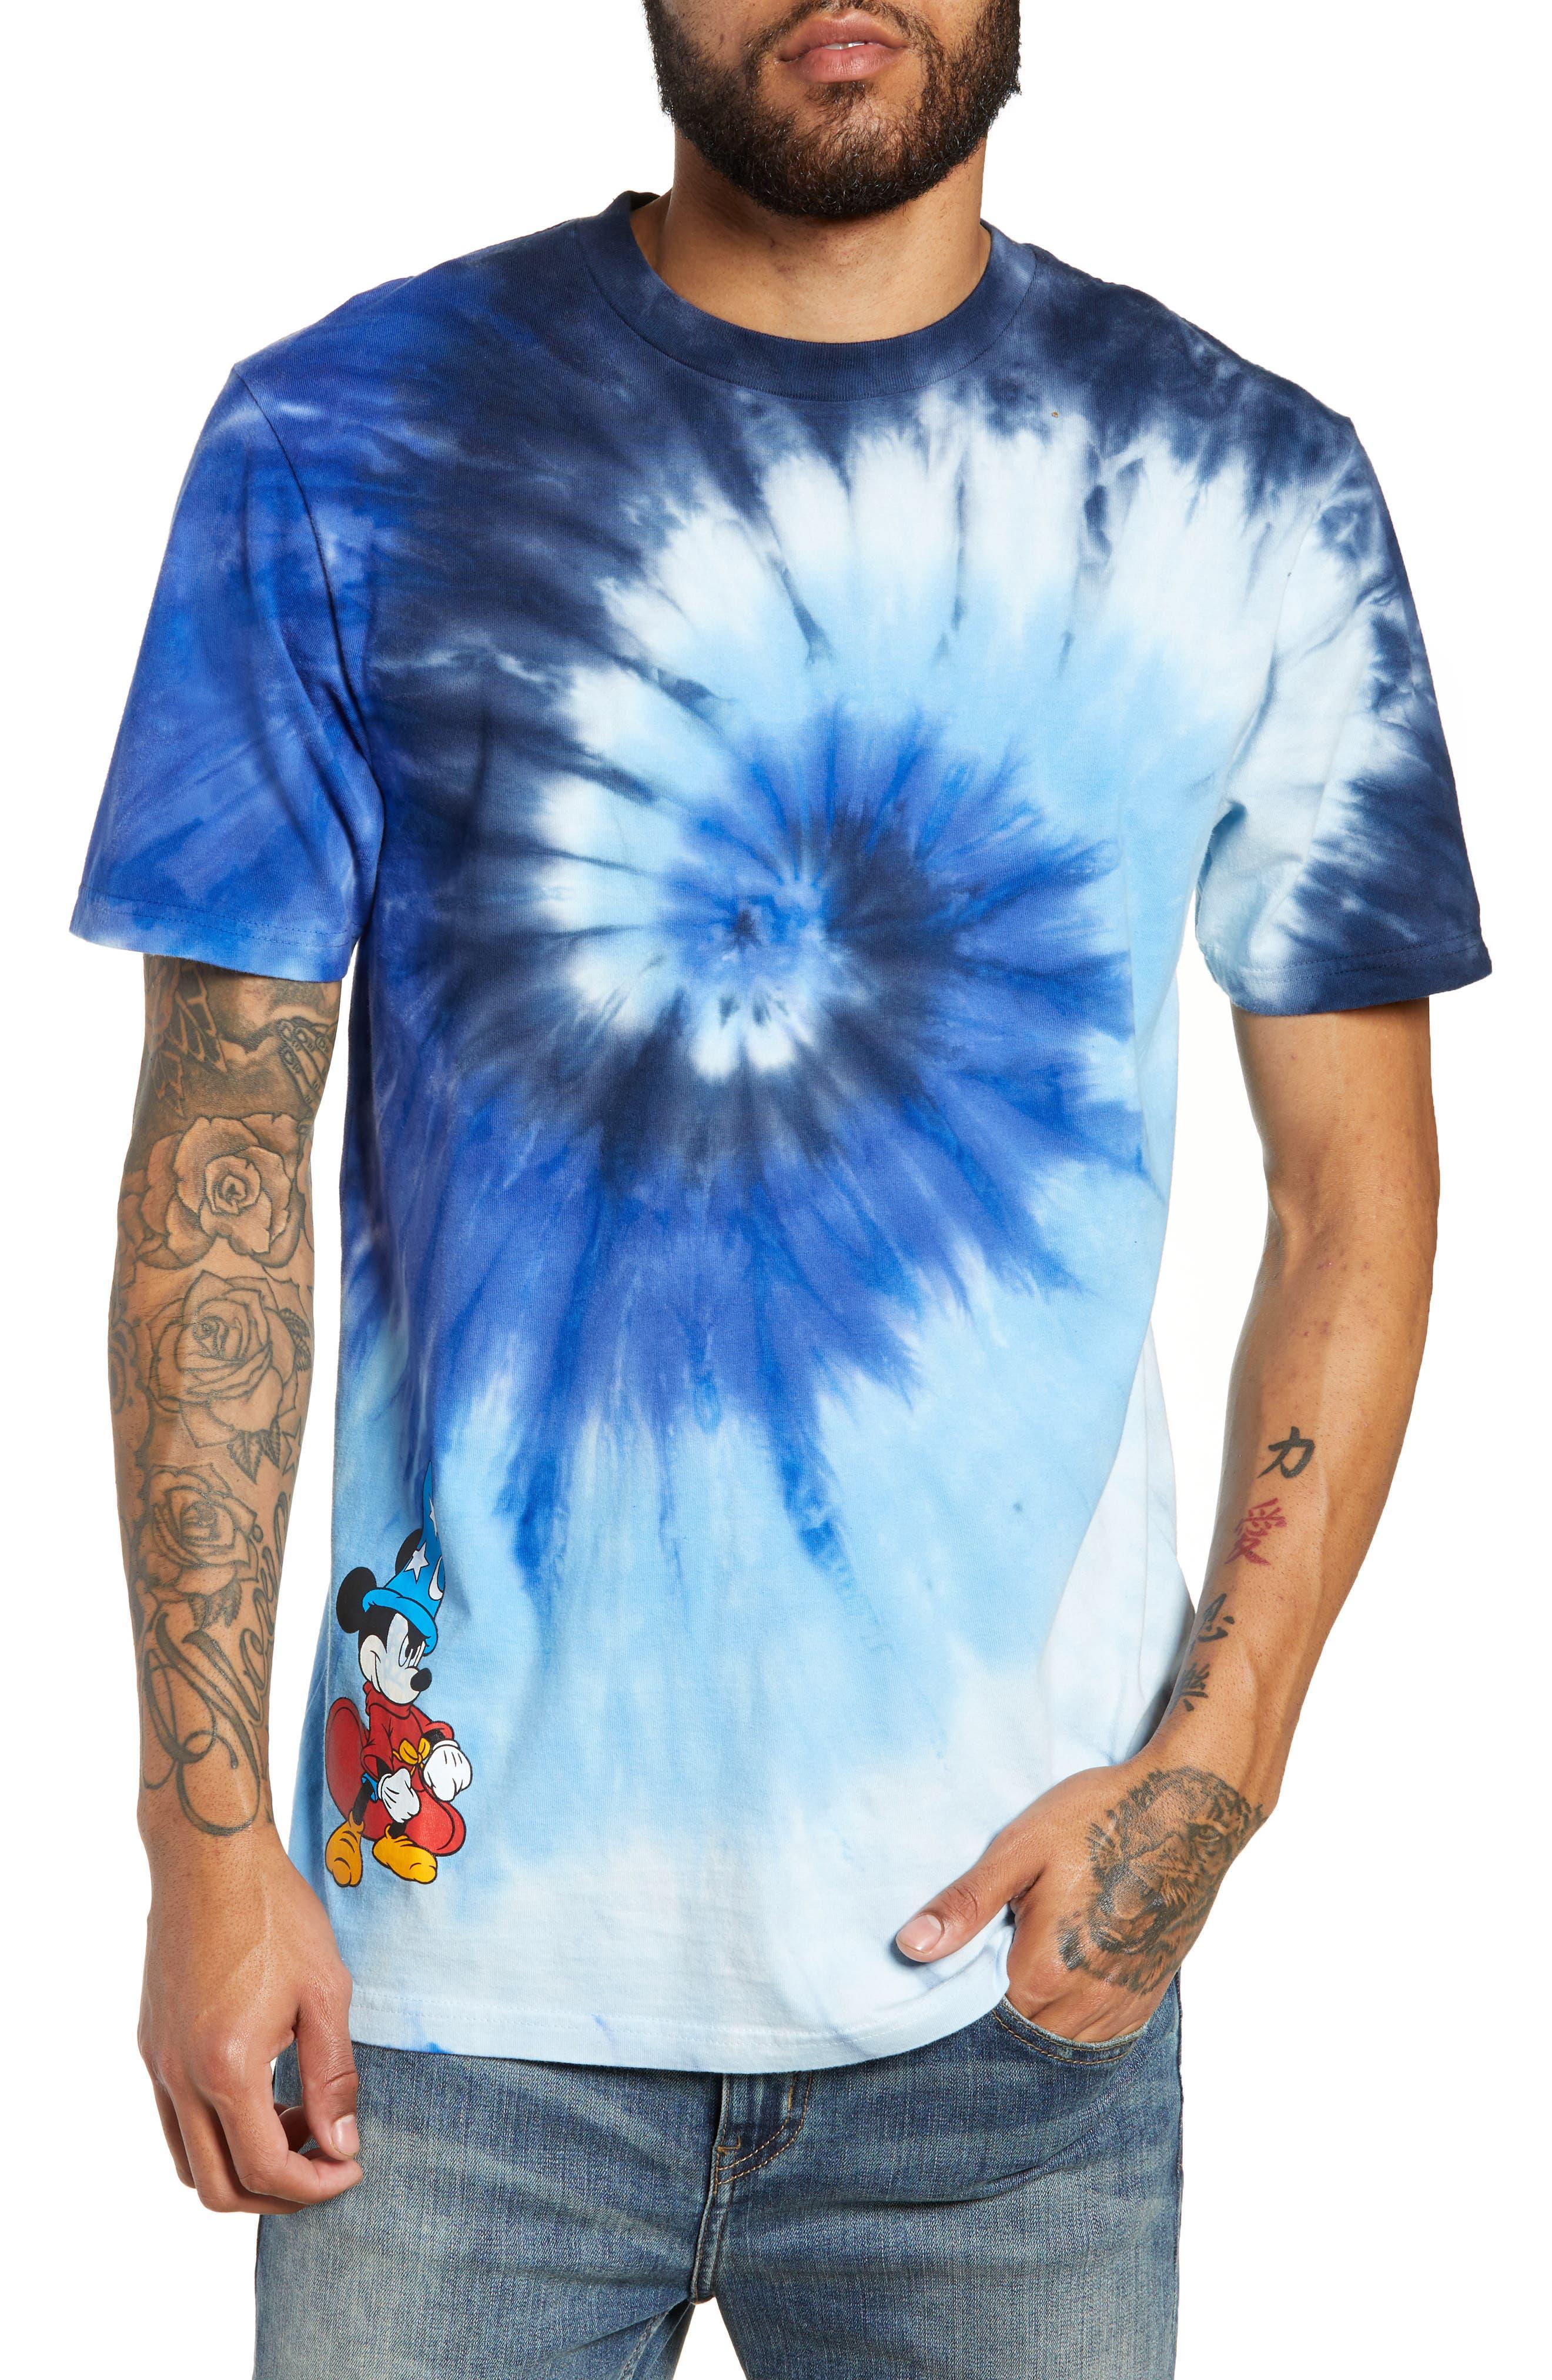 x Disney Mickey's 90th Anniversary T-Shirt,                         Main,                         color, MICKEY FANTASIA TIE DYE